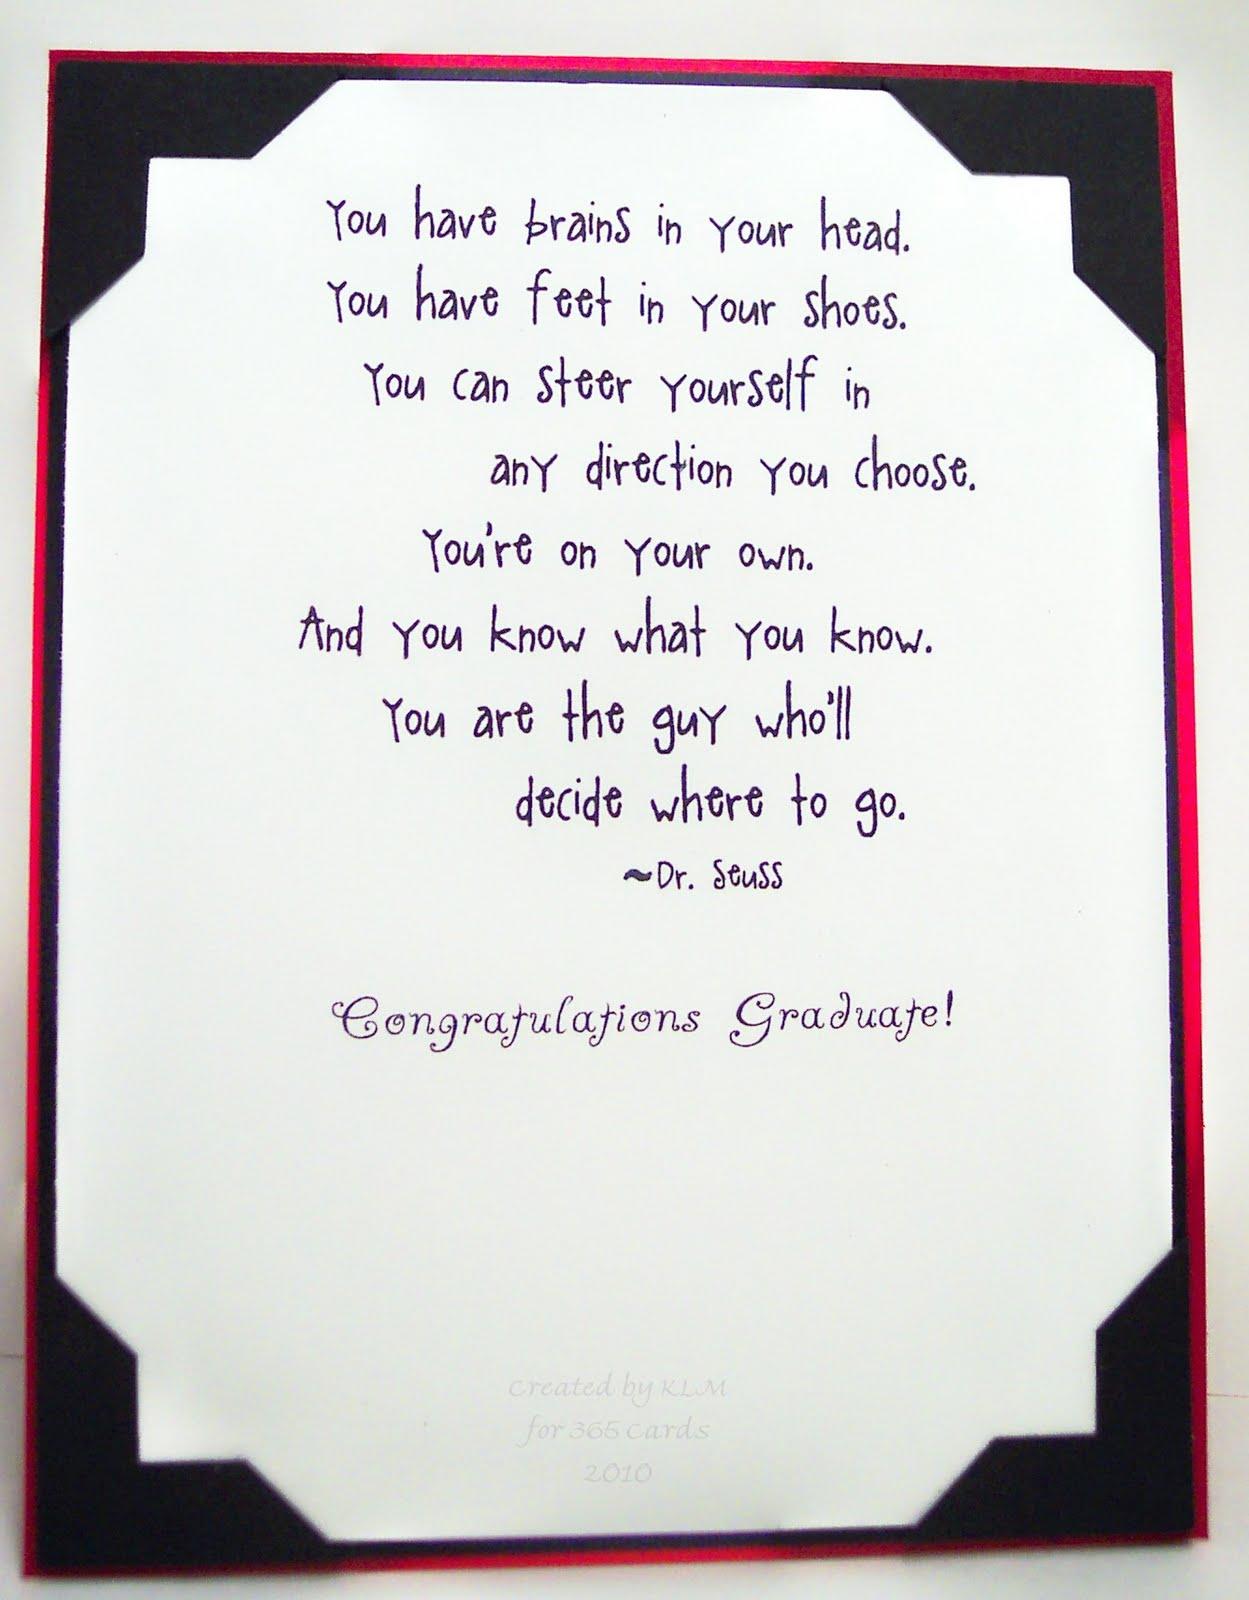 grade graduation wishes dress images jpg 1249x1600 8th grade graduation card messages